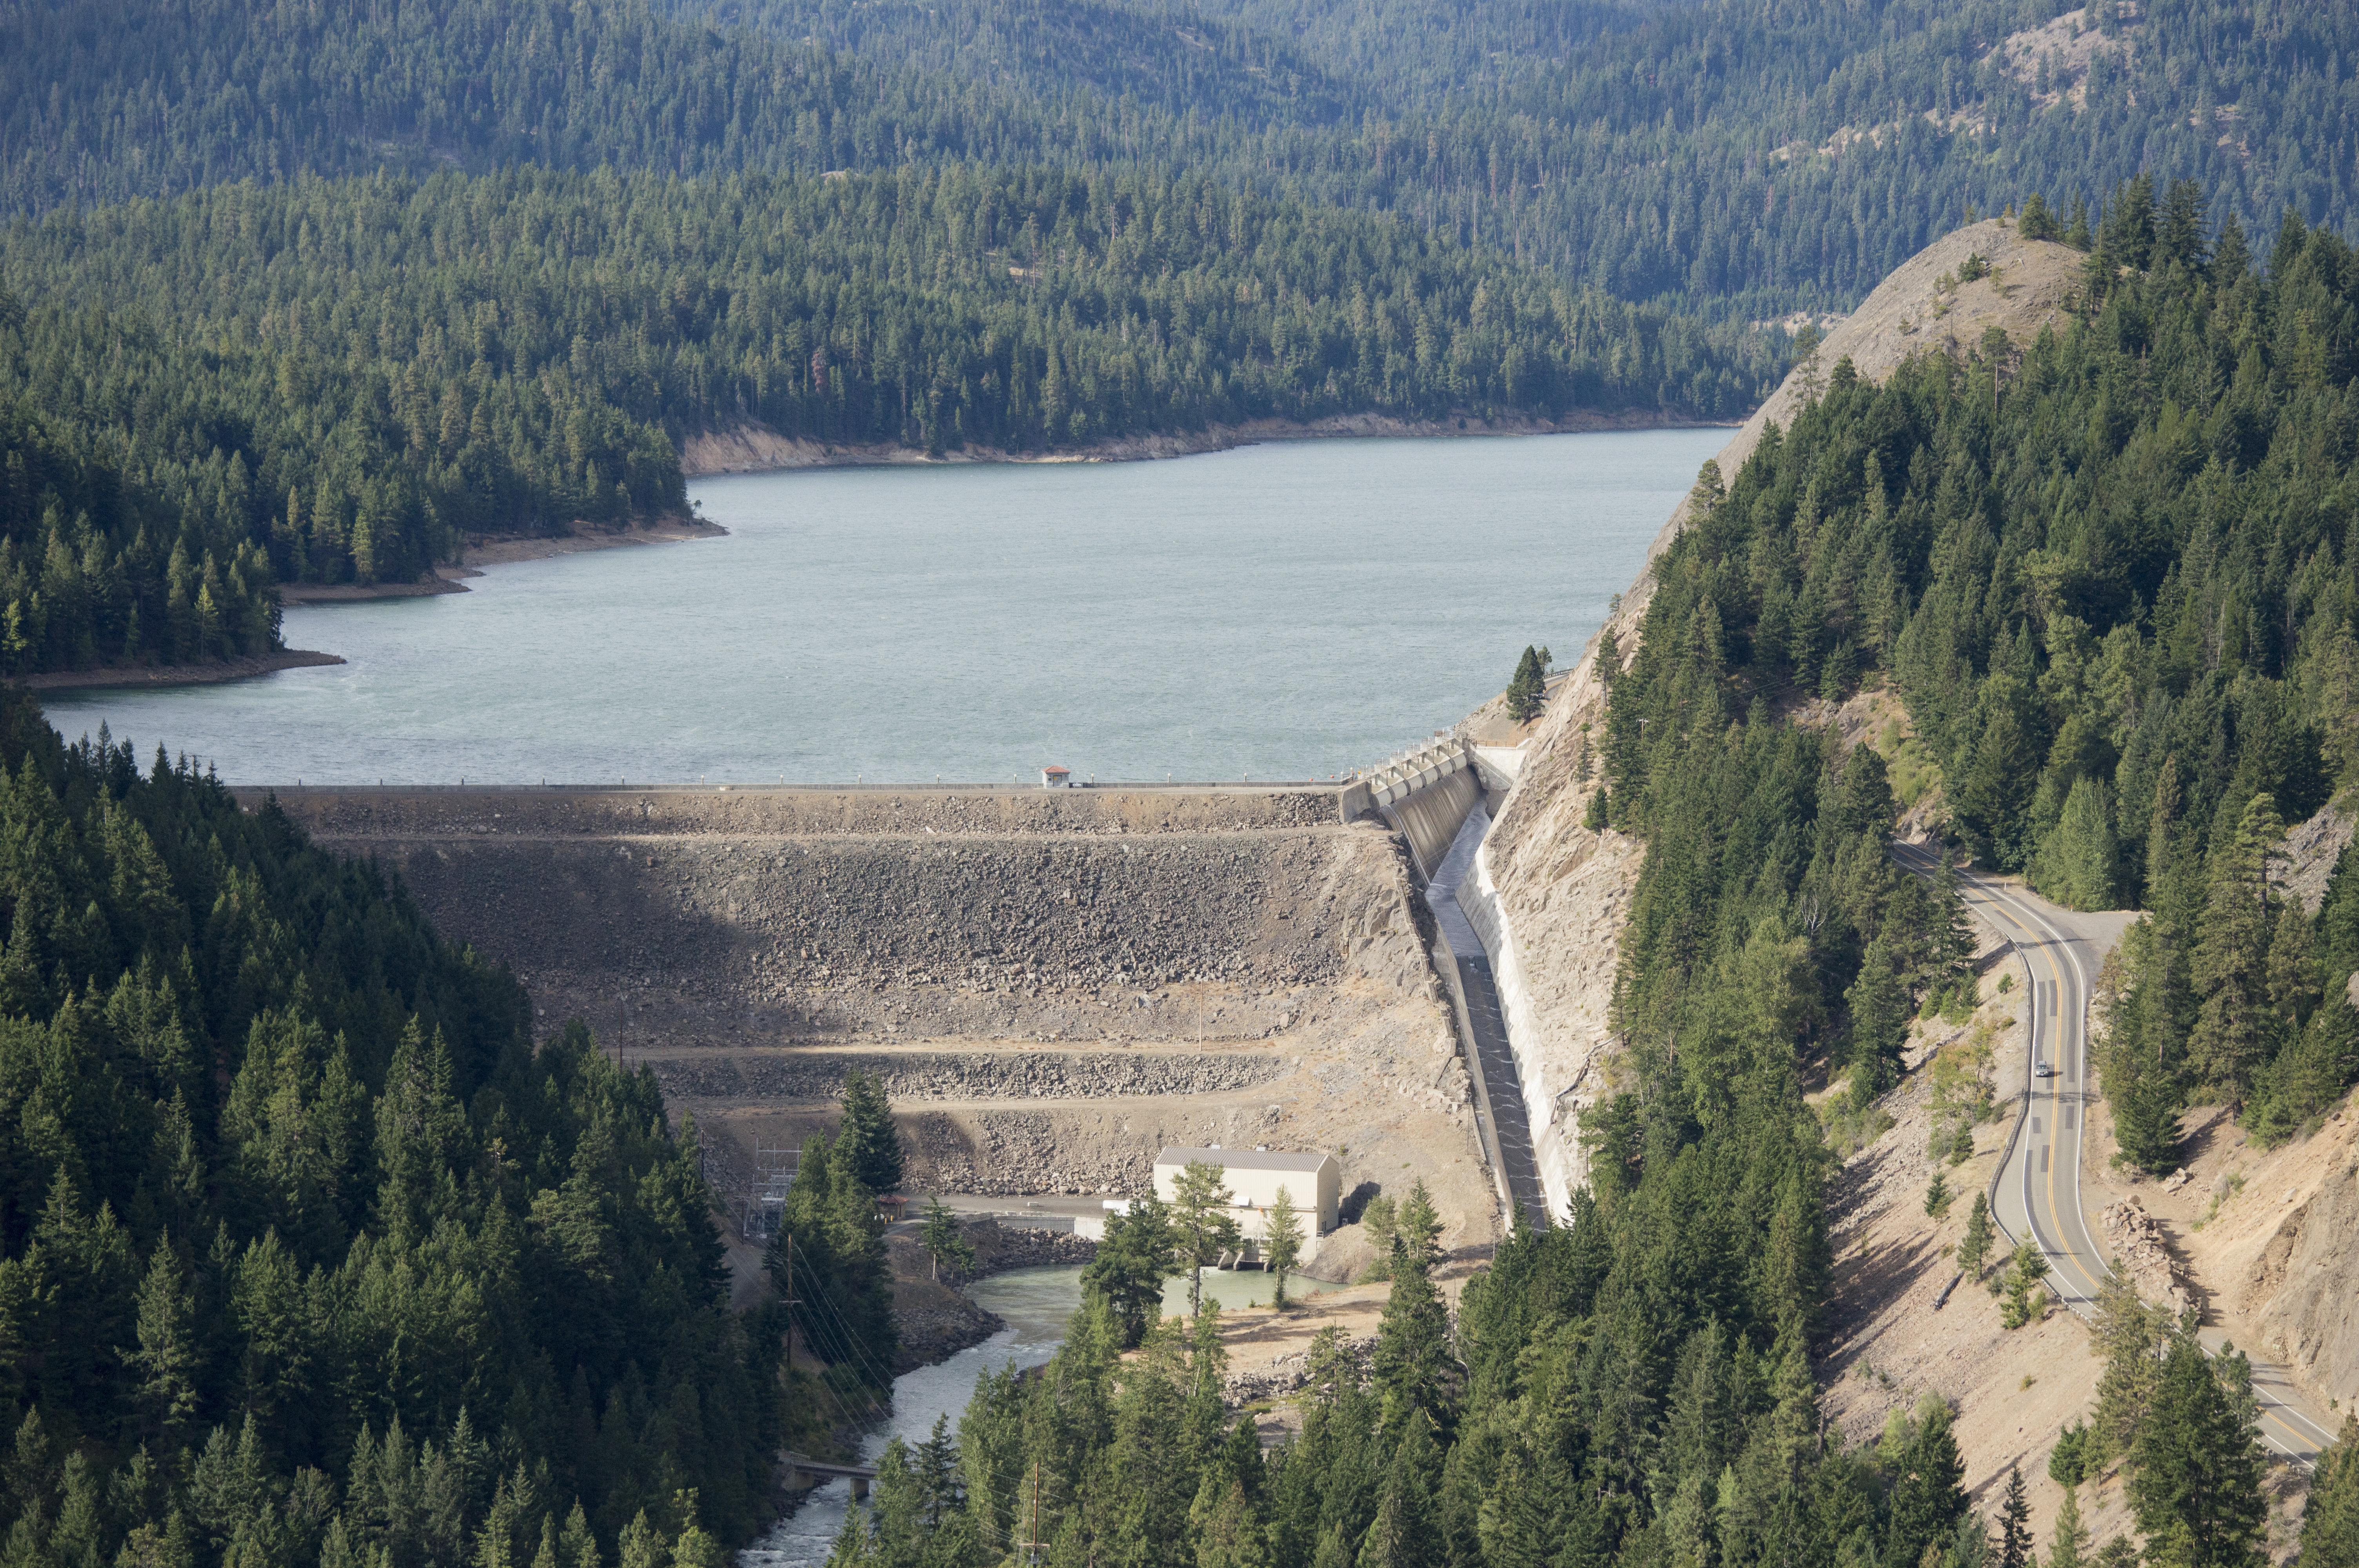 Tieton Dam - Wikipedia